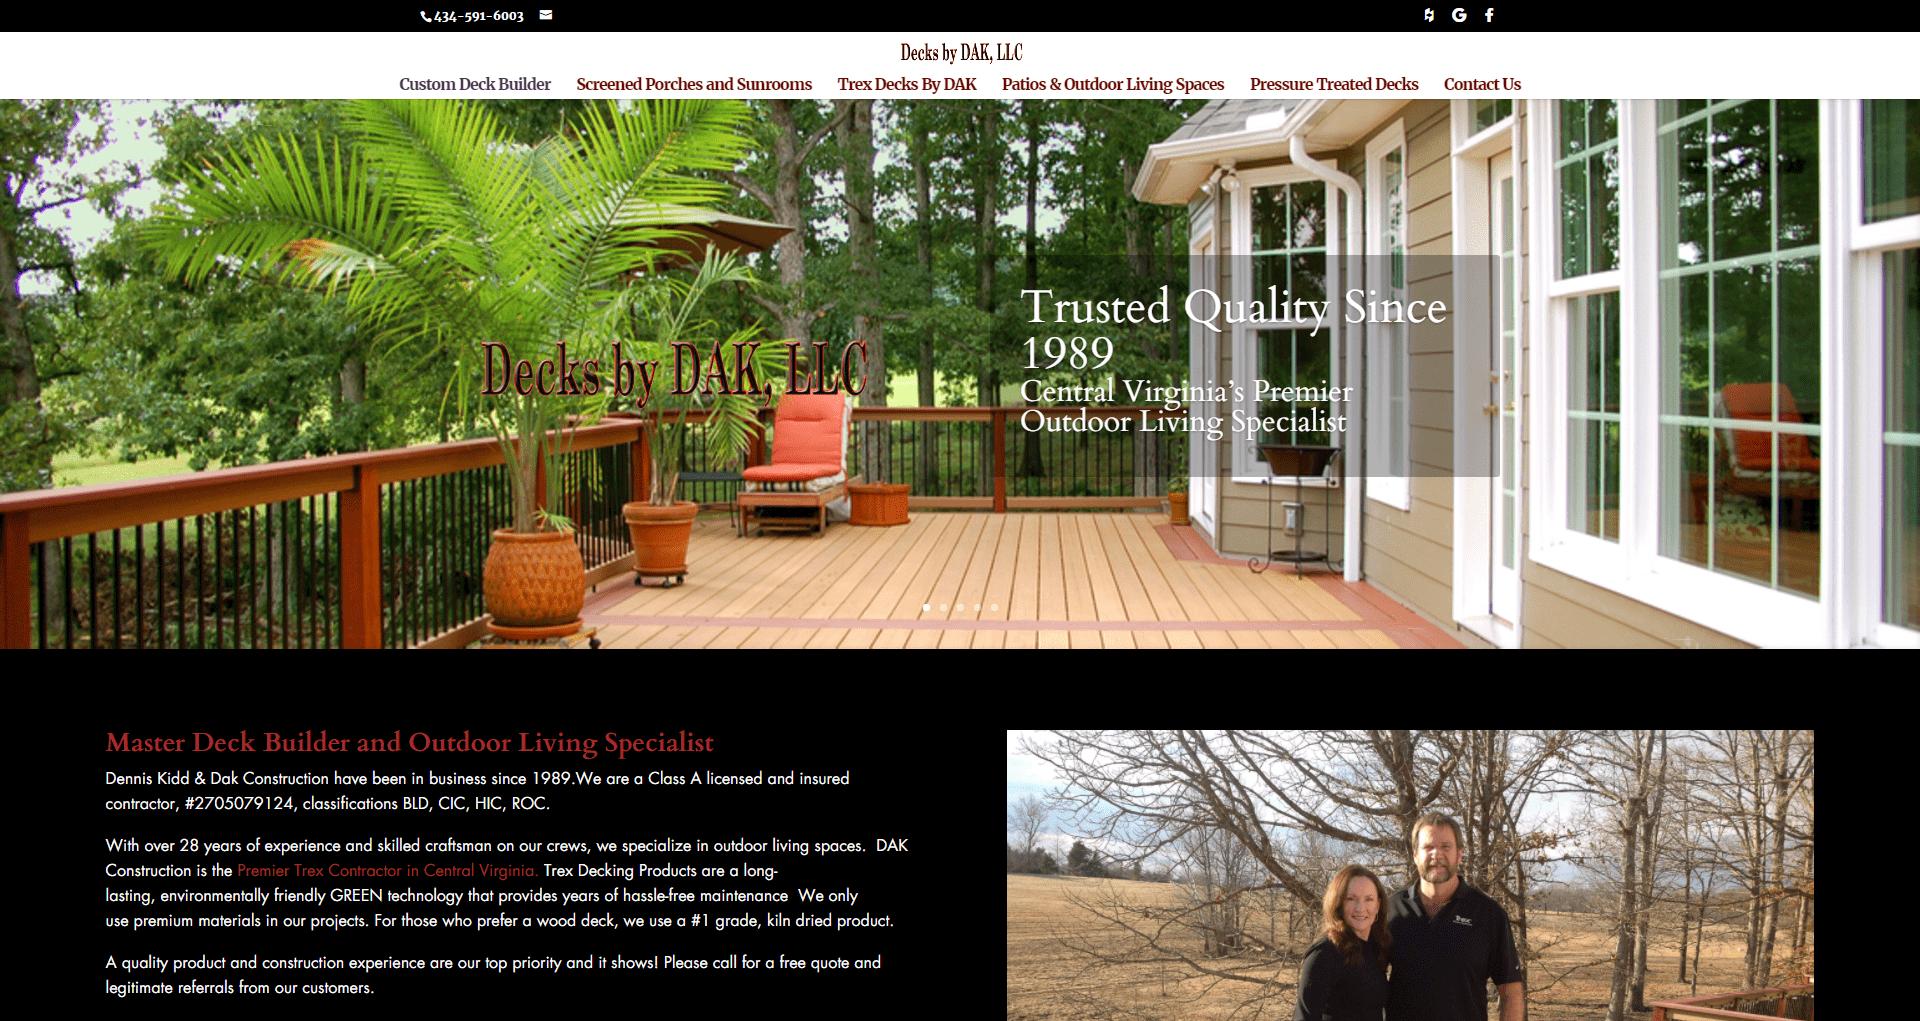 DAK Construction Website